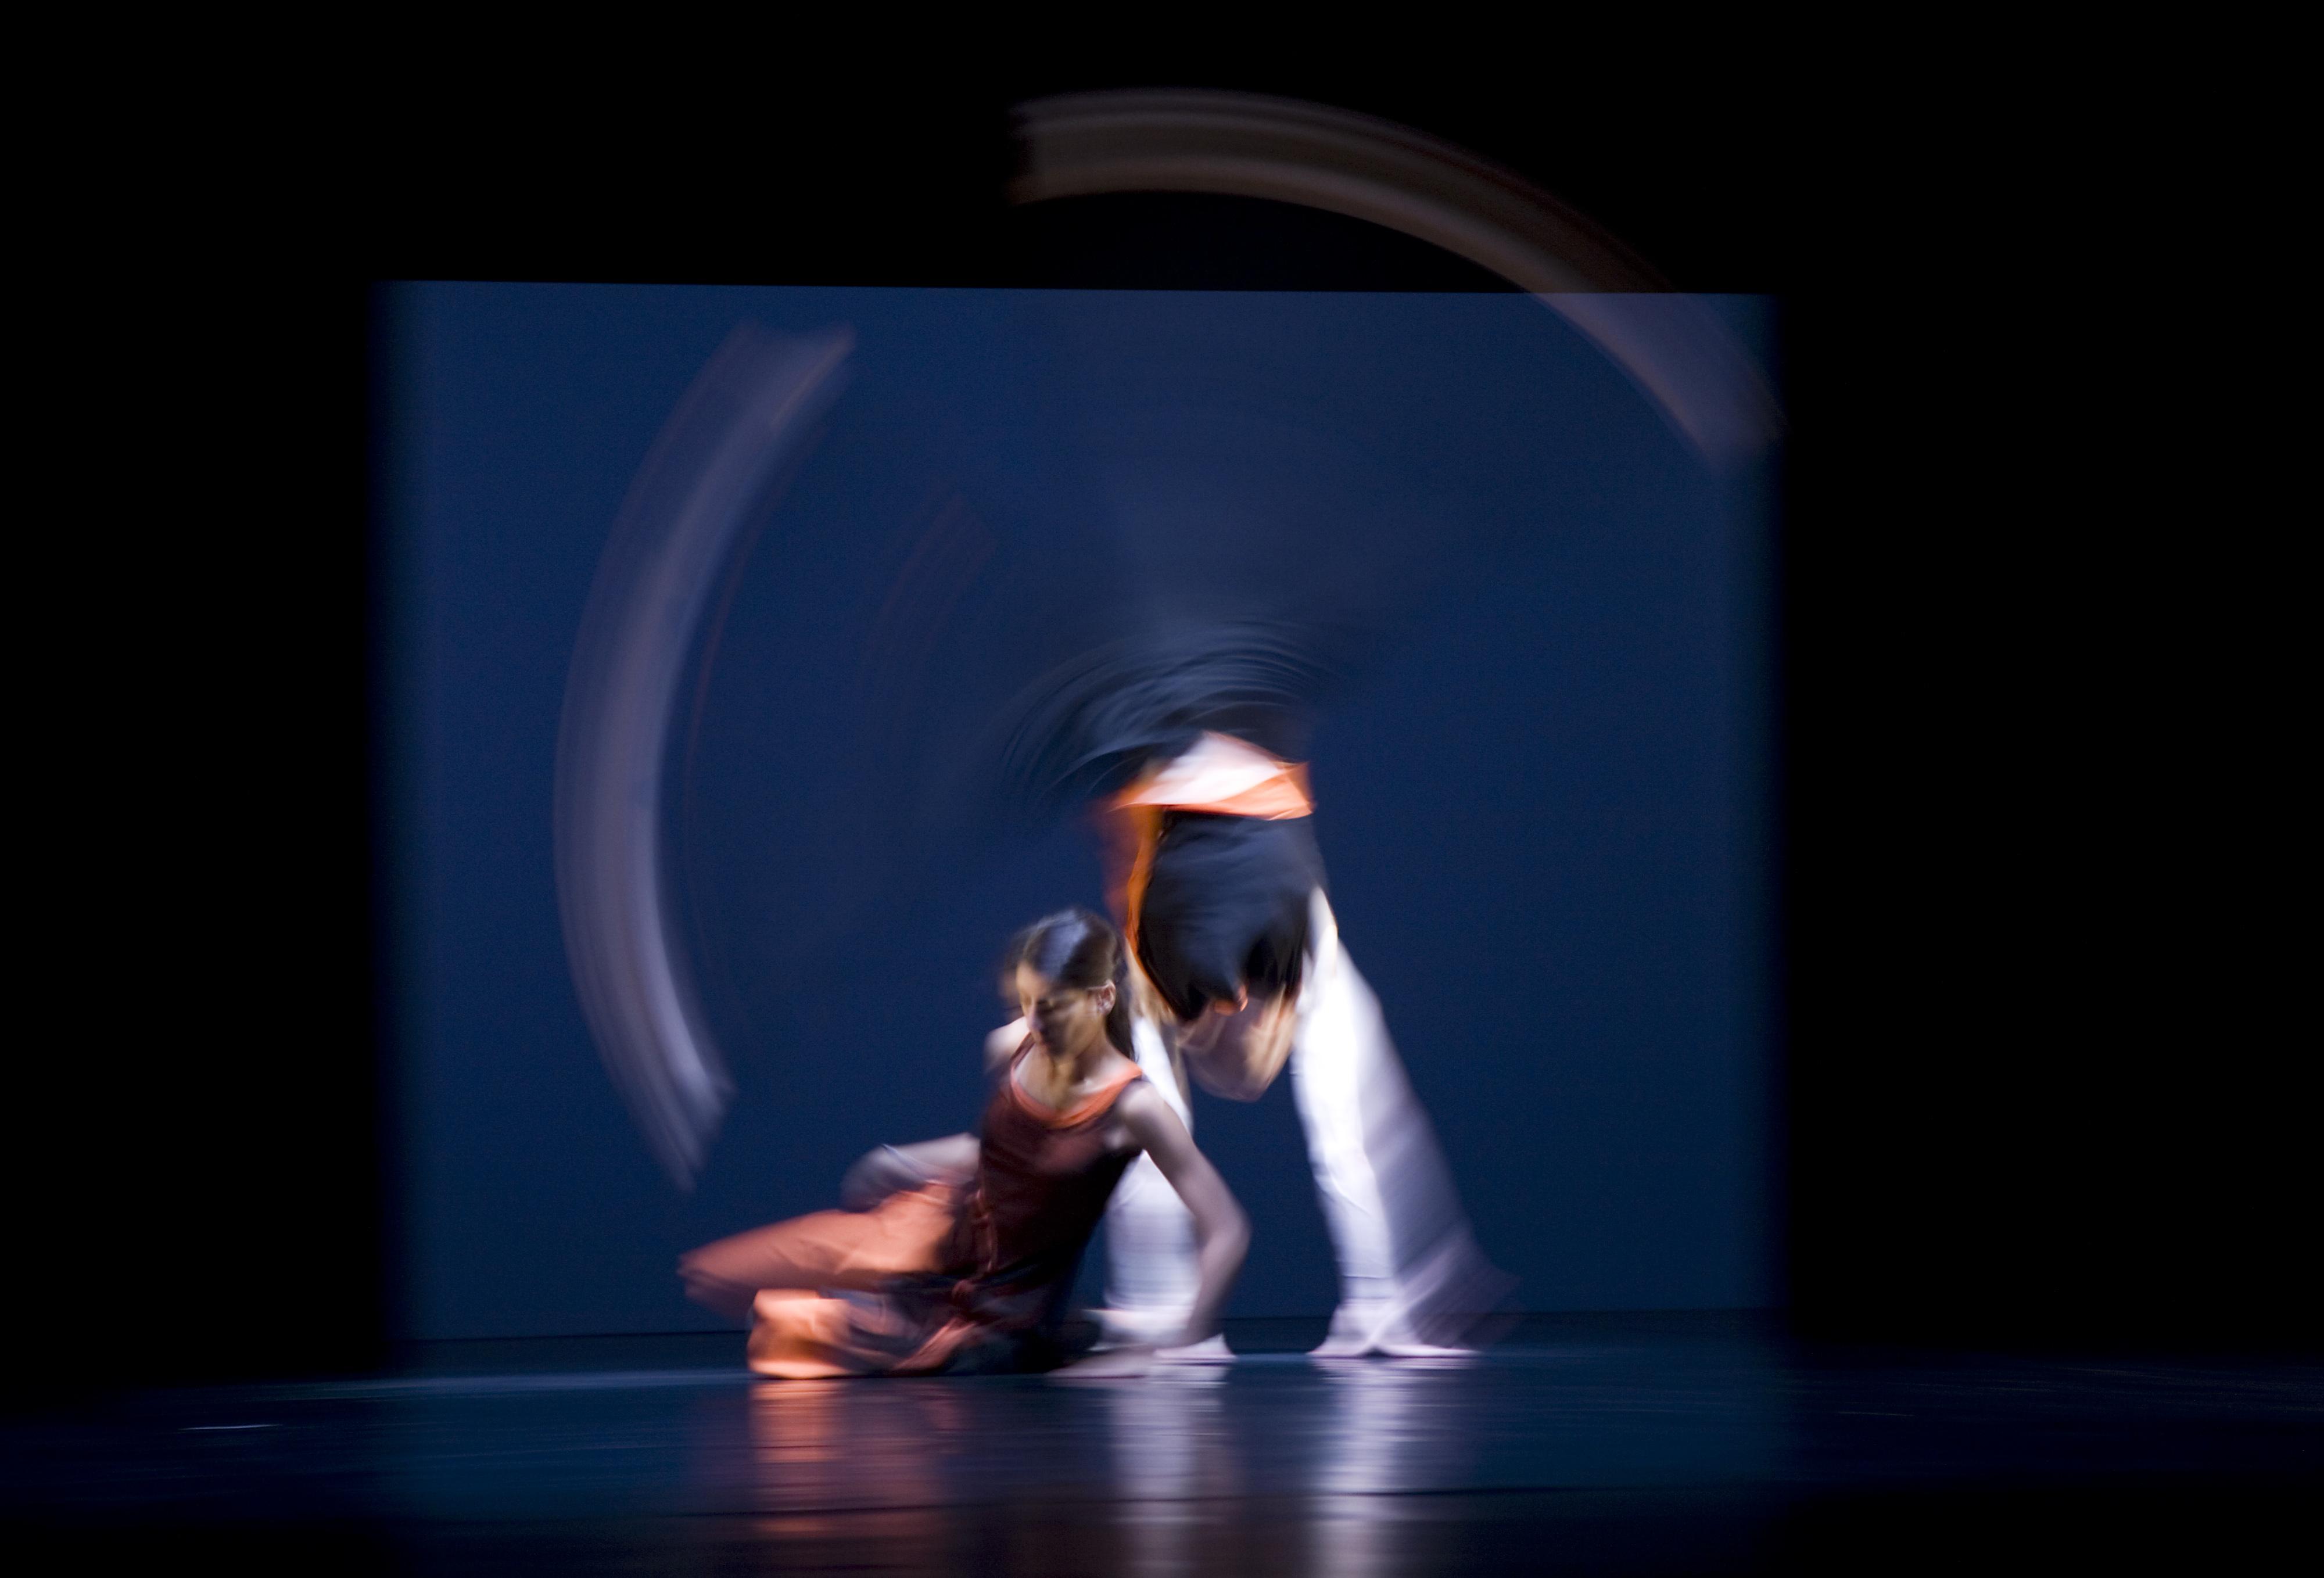 https://i1.wp.com/upload.wikimedia.org/wikipedia/commons/e/e5/Munich_-_Two_dancers_captured_in_blurred_movement_-_7800.jpg